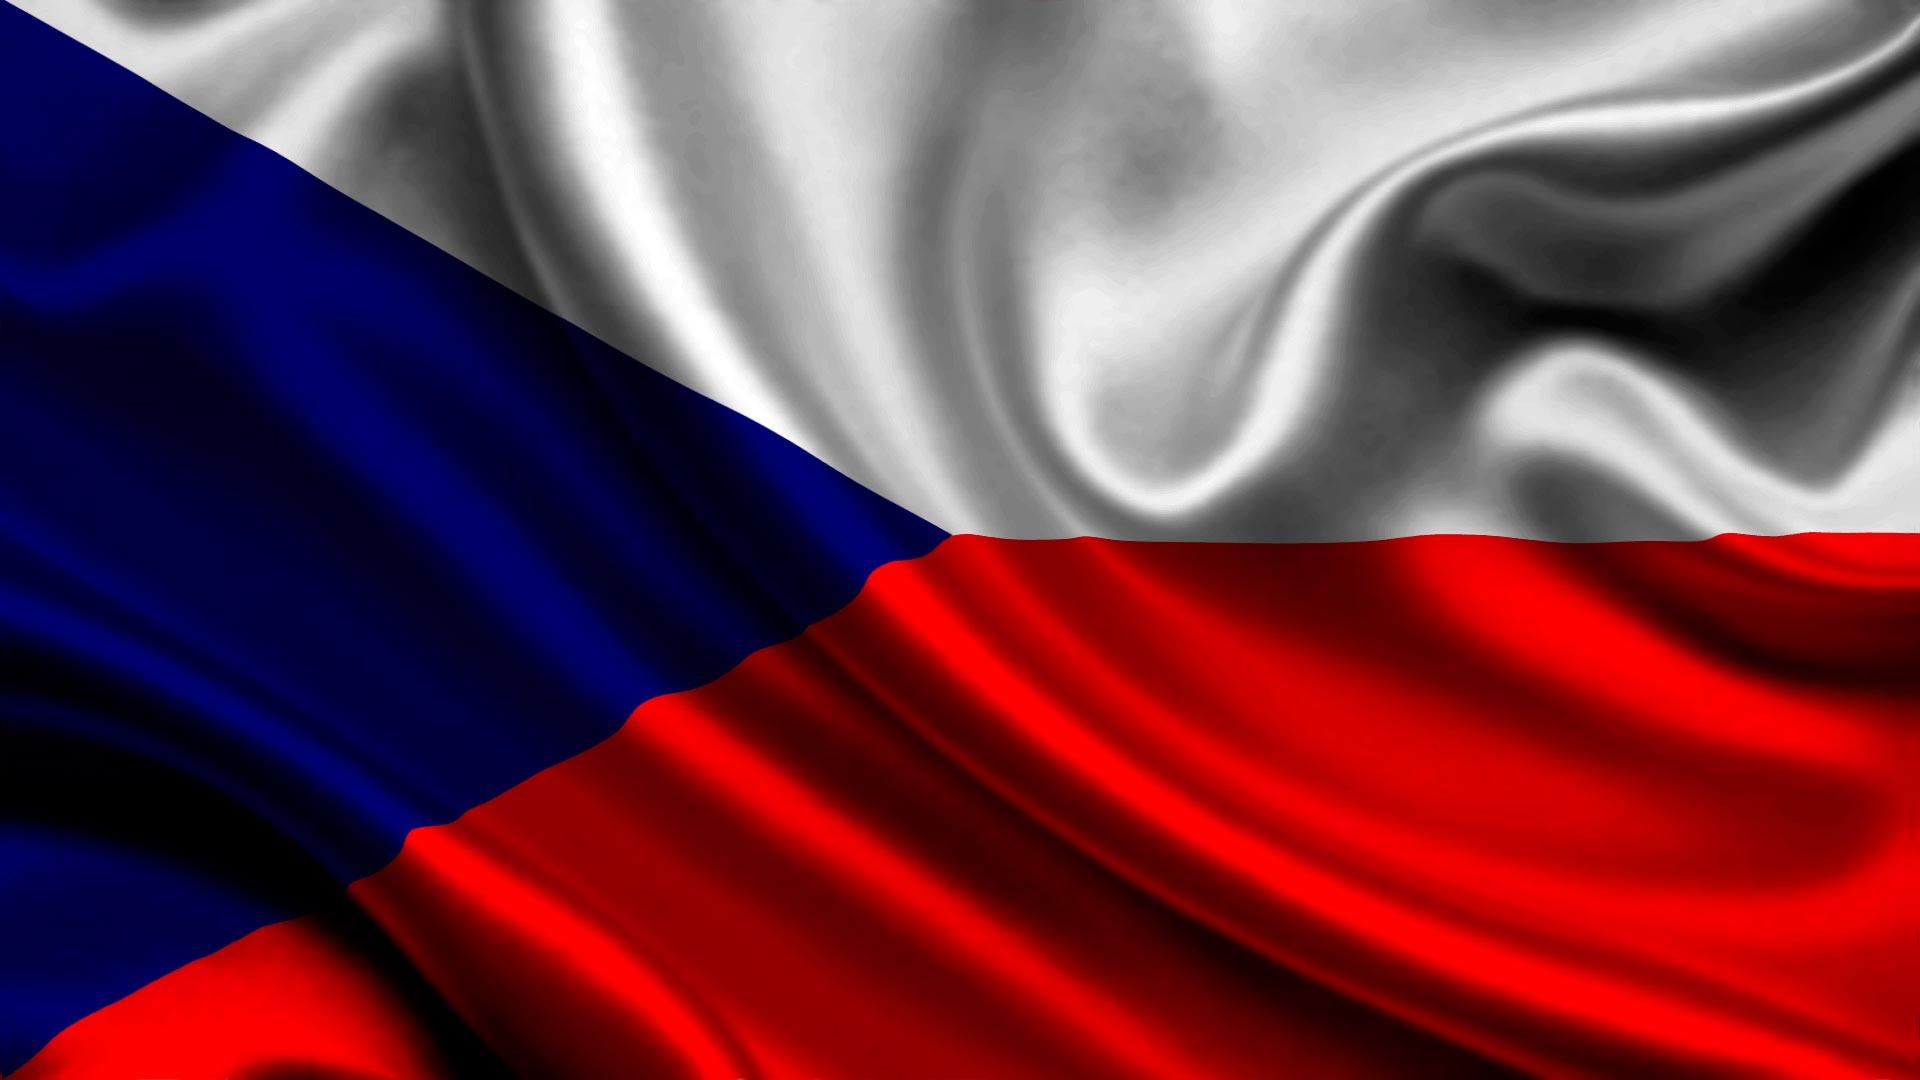 MotoGP: Czech GP Ticket Sales Suspended - Asphalt & Rubber